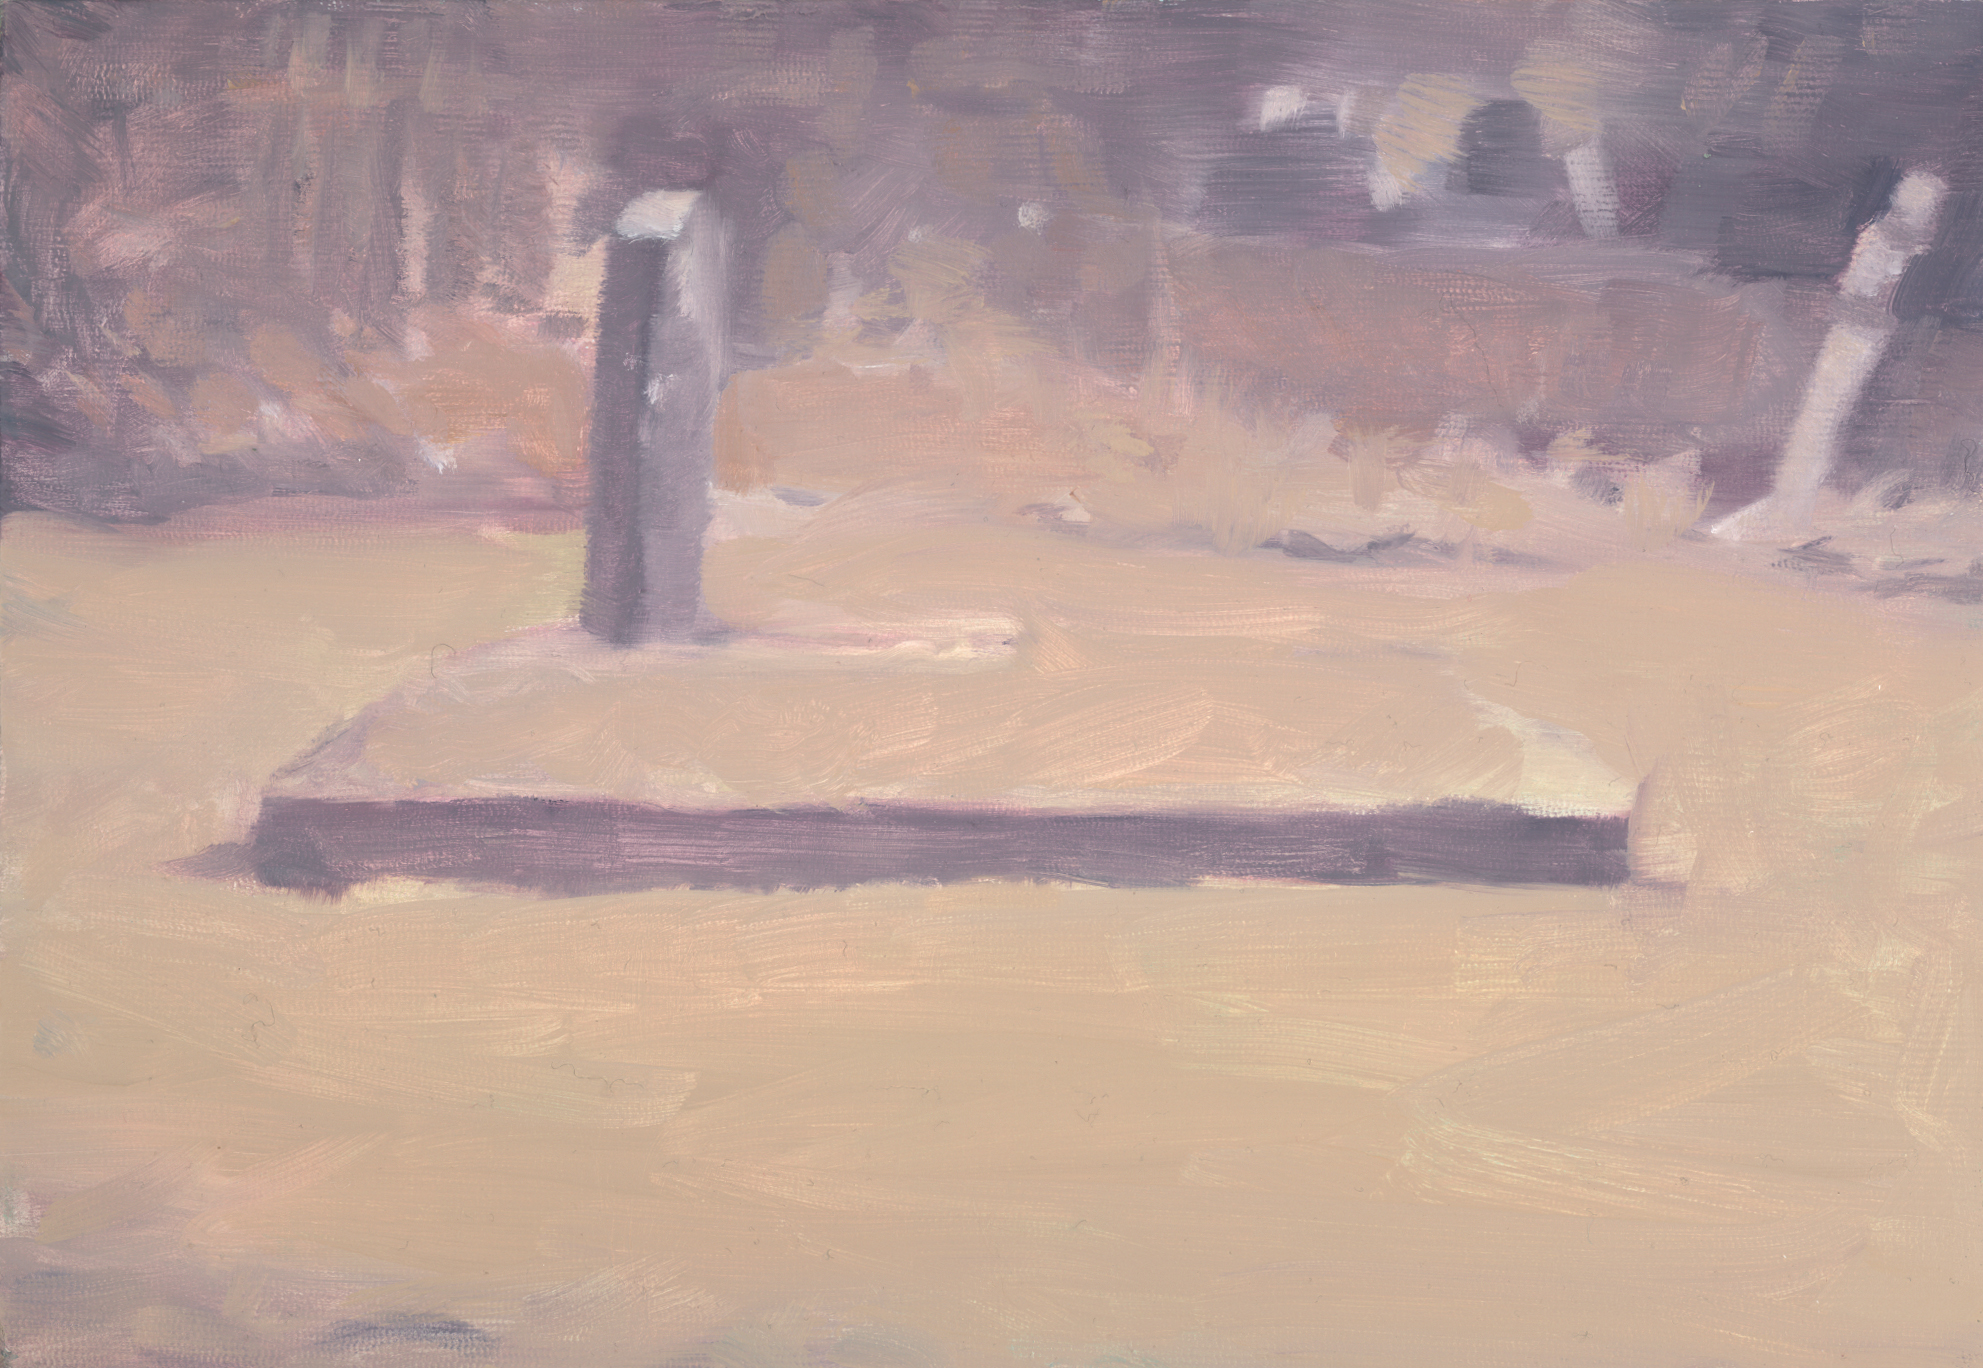 Turville Grave